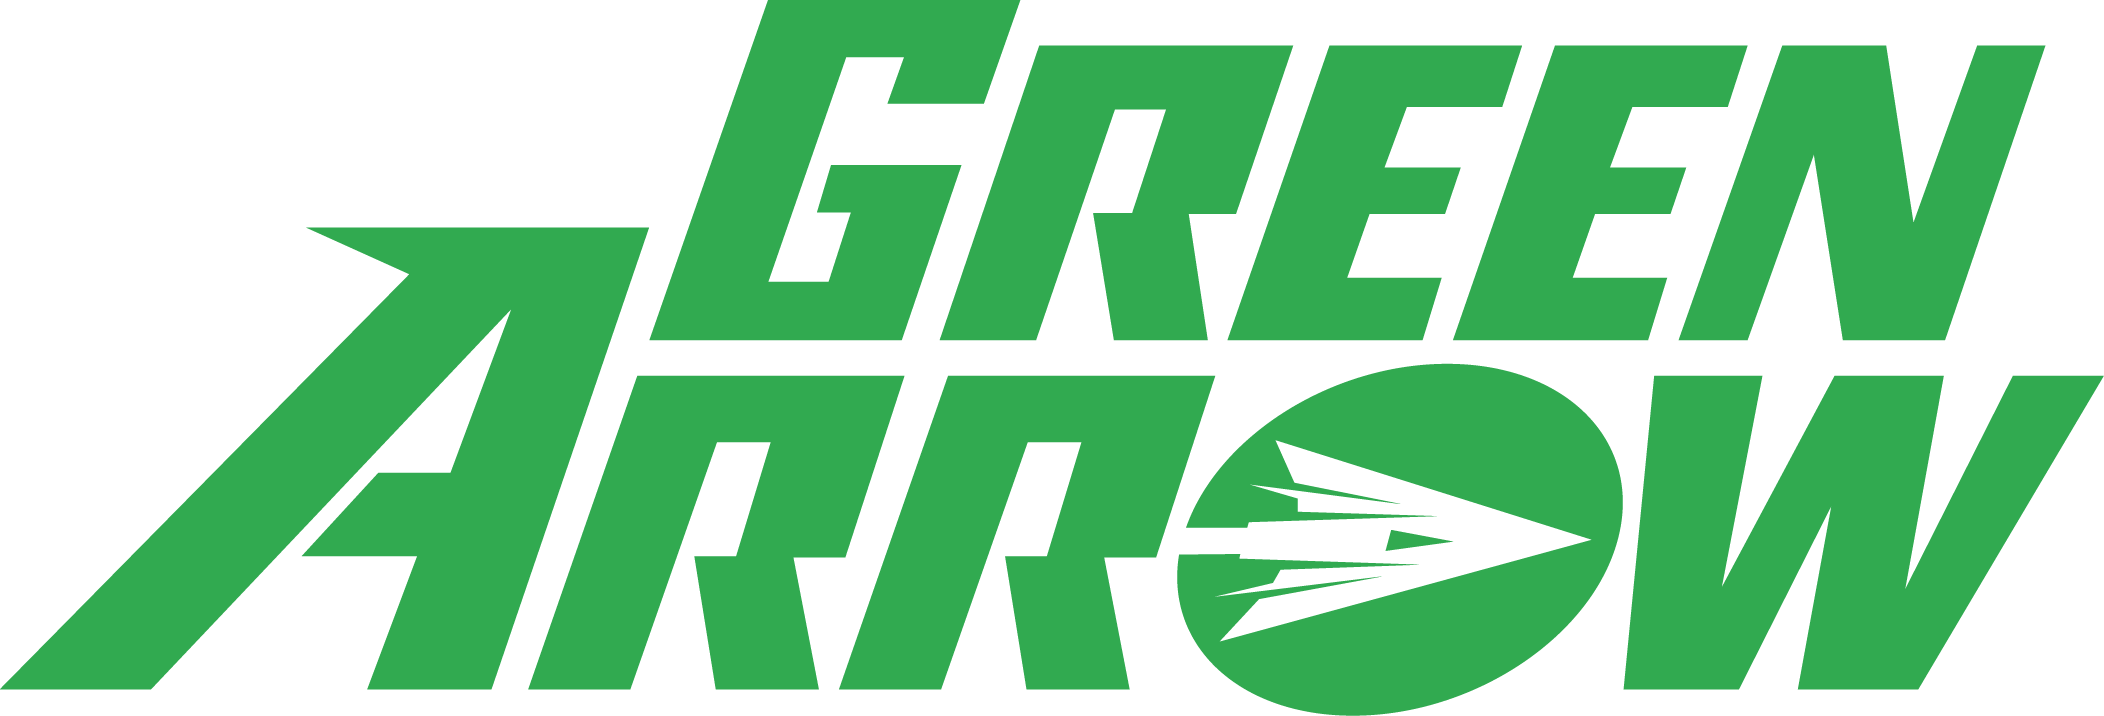 Logo Arrow PNG Transparent Logo Arrow.PNG Images.